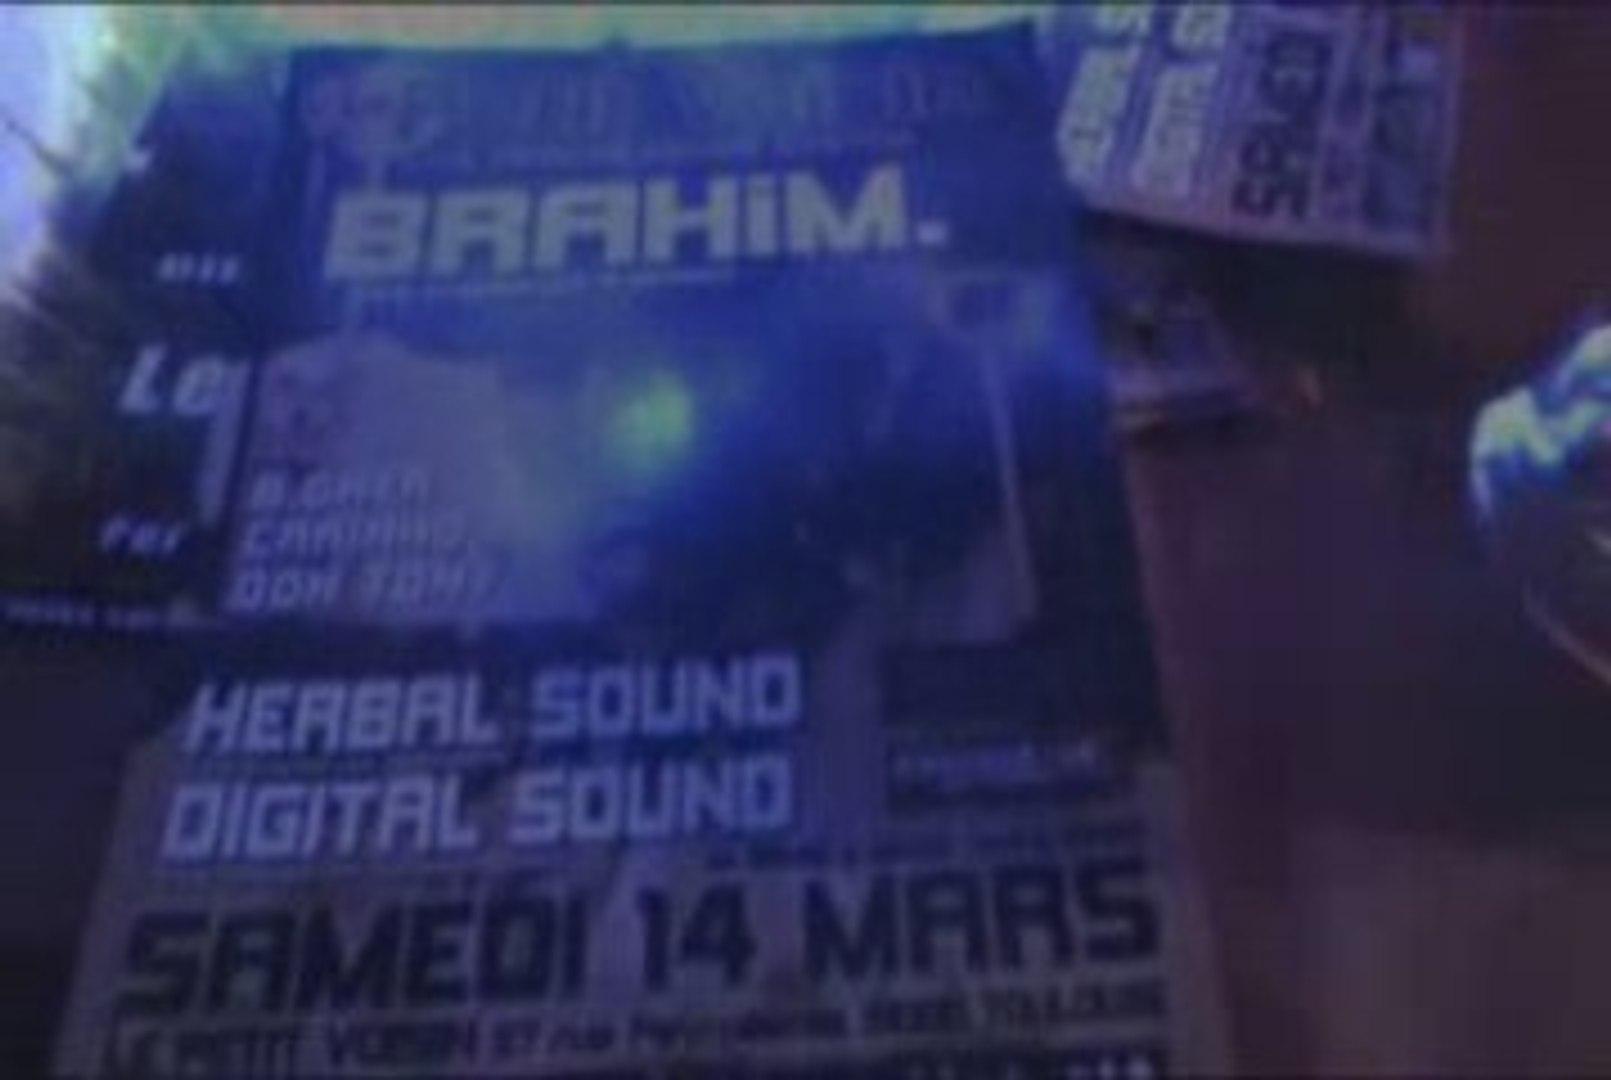 South show Digital feat Brahim